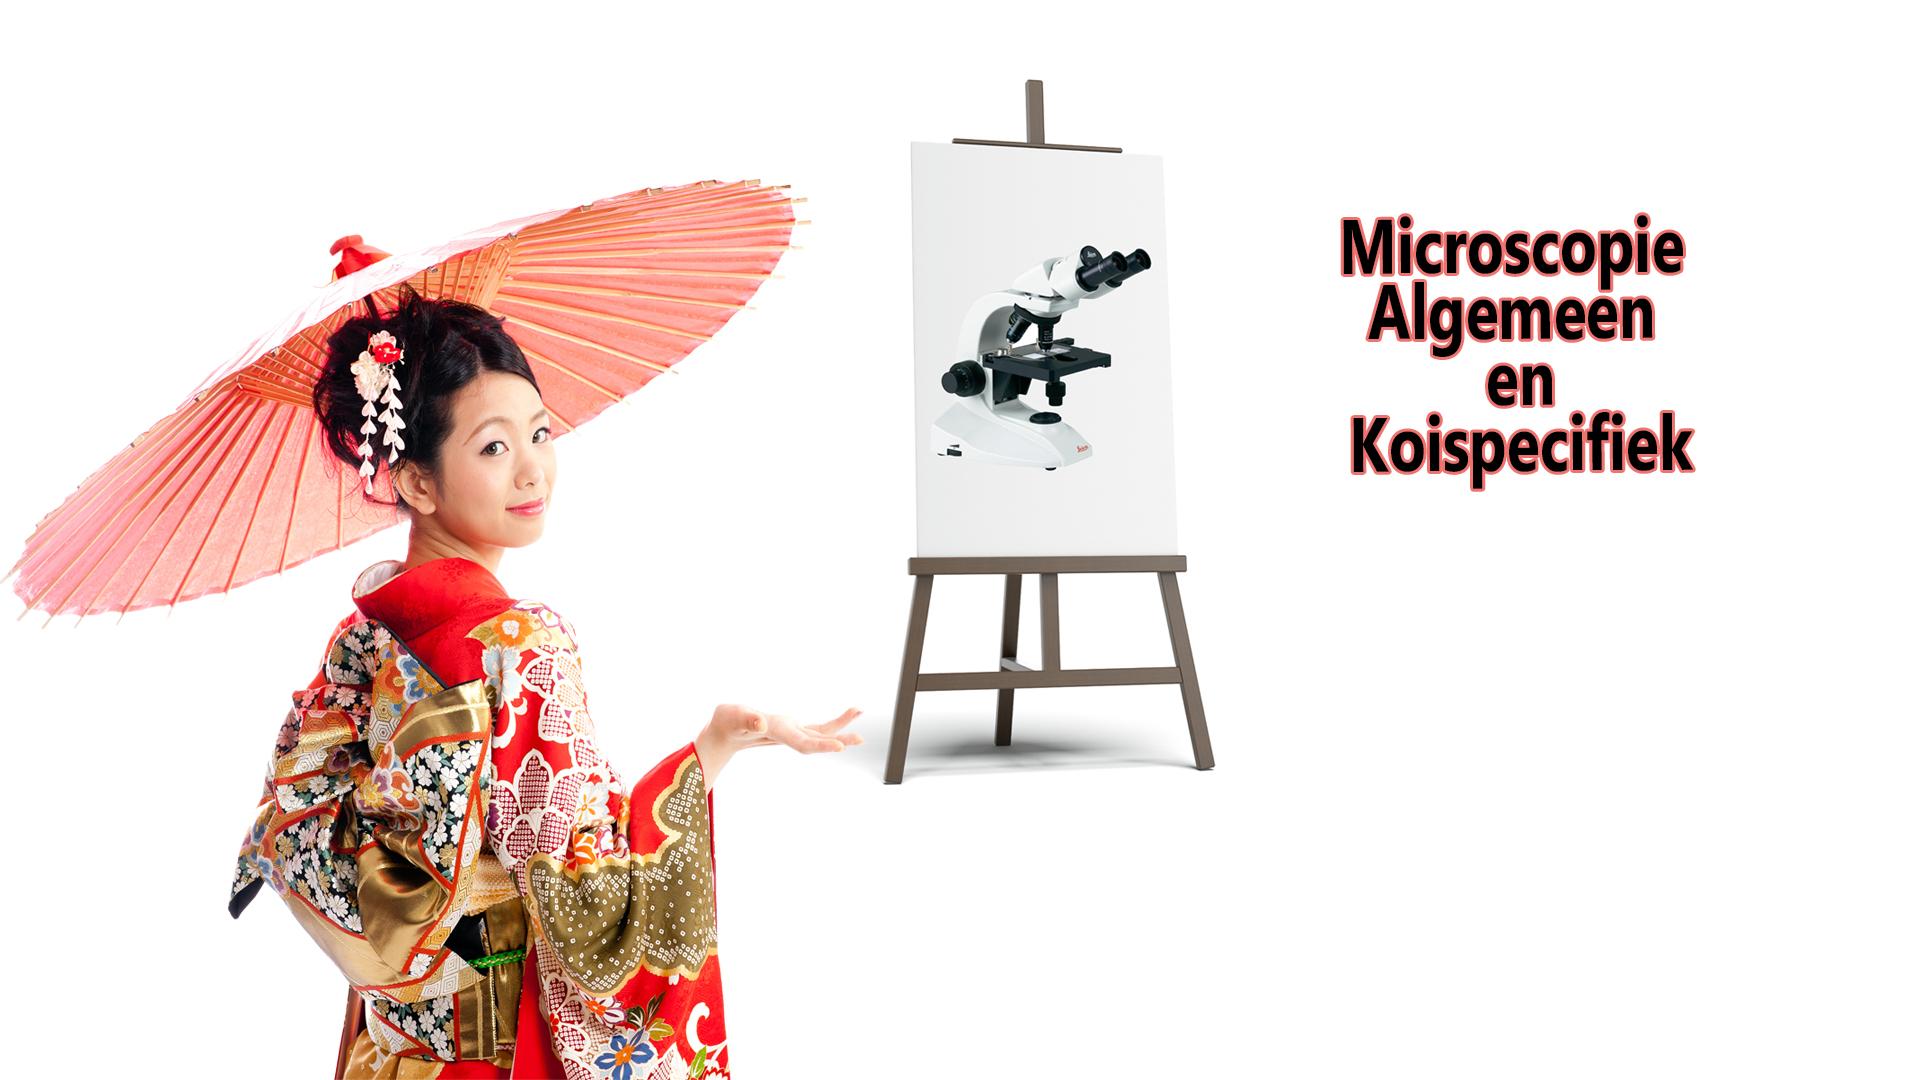 Microscopie Praktijk